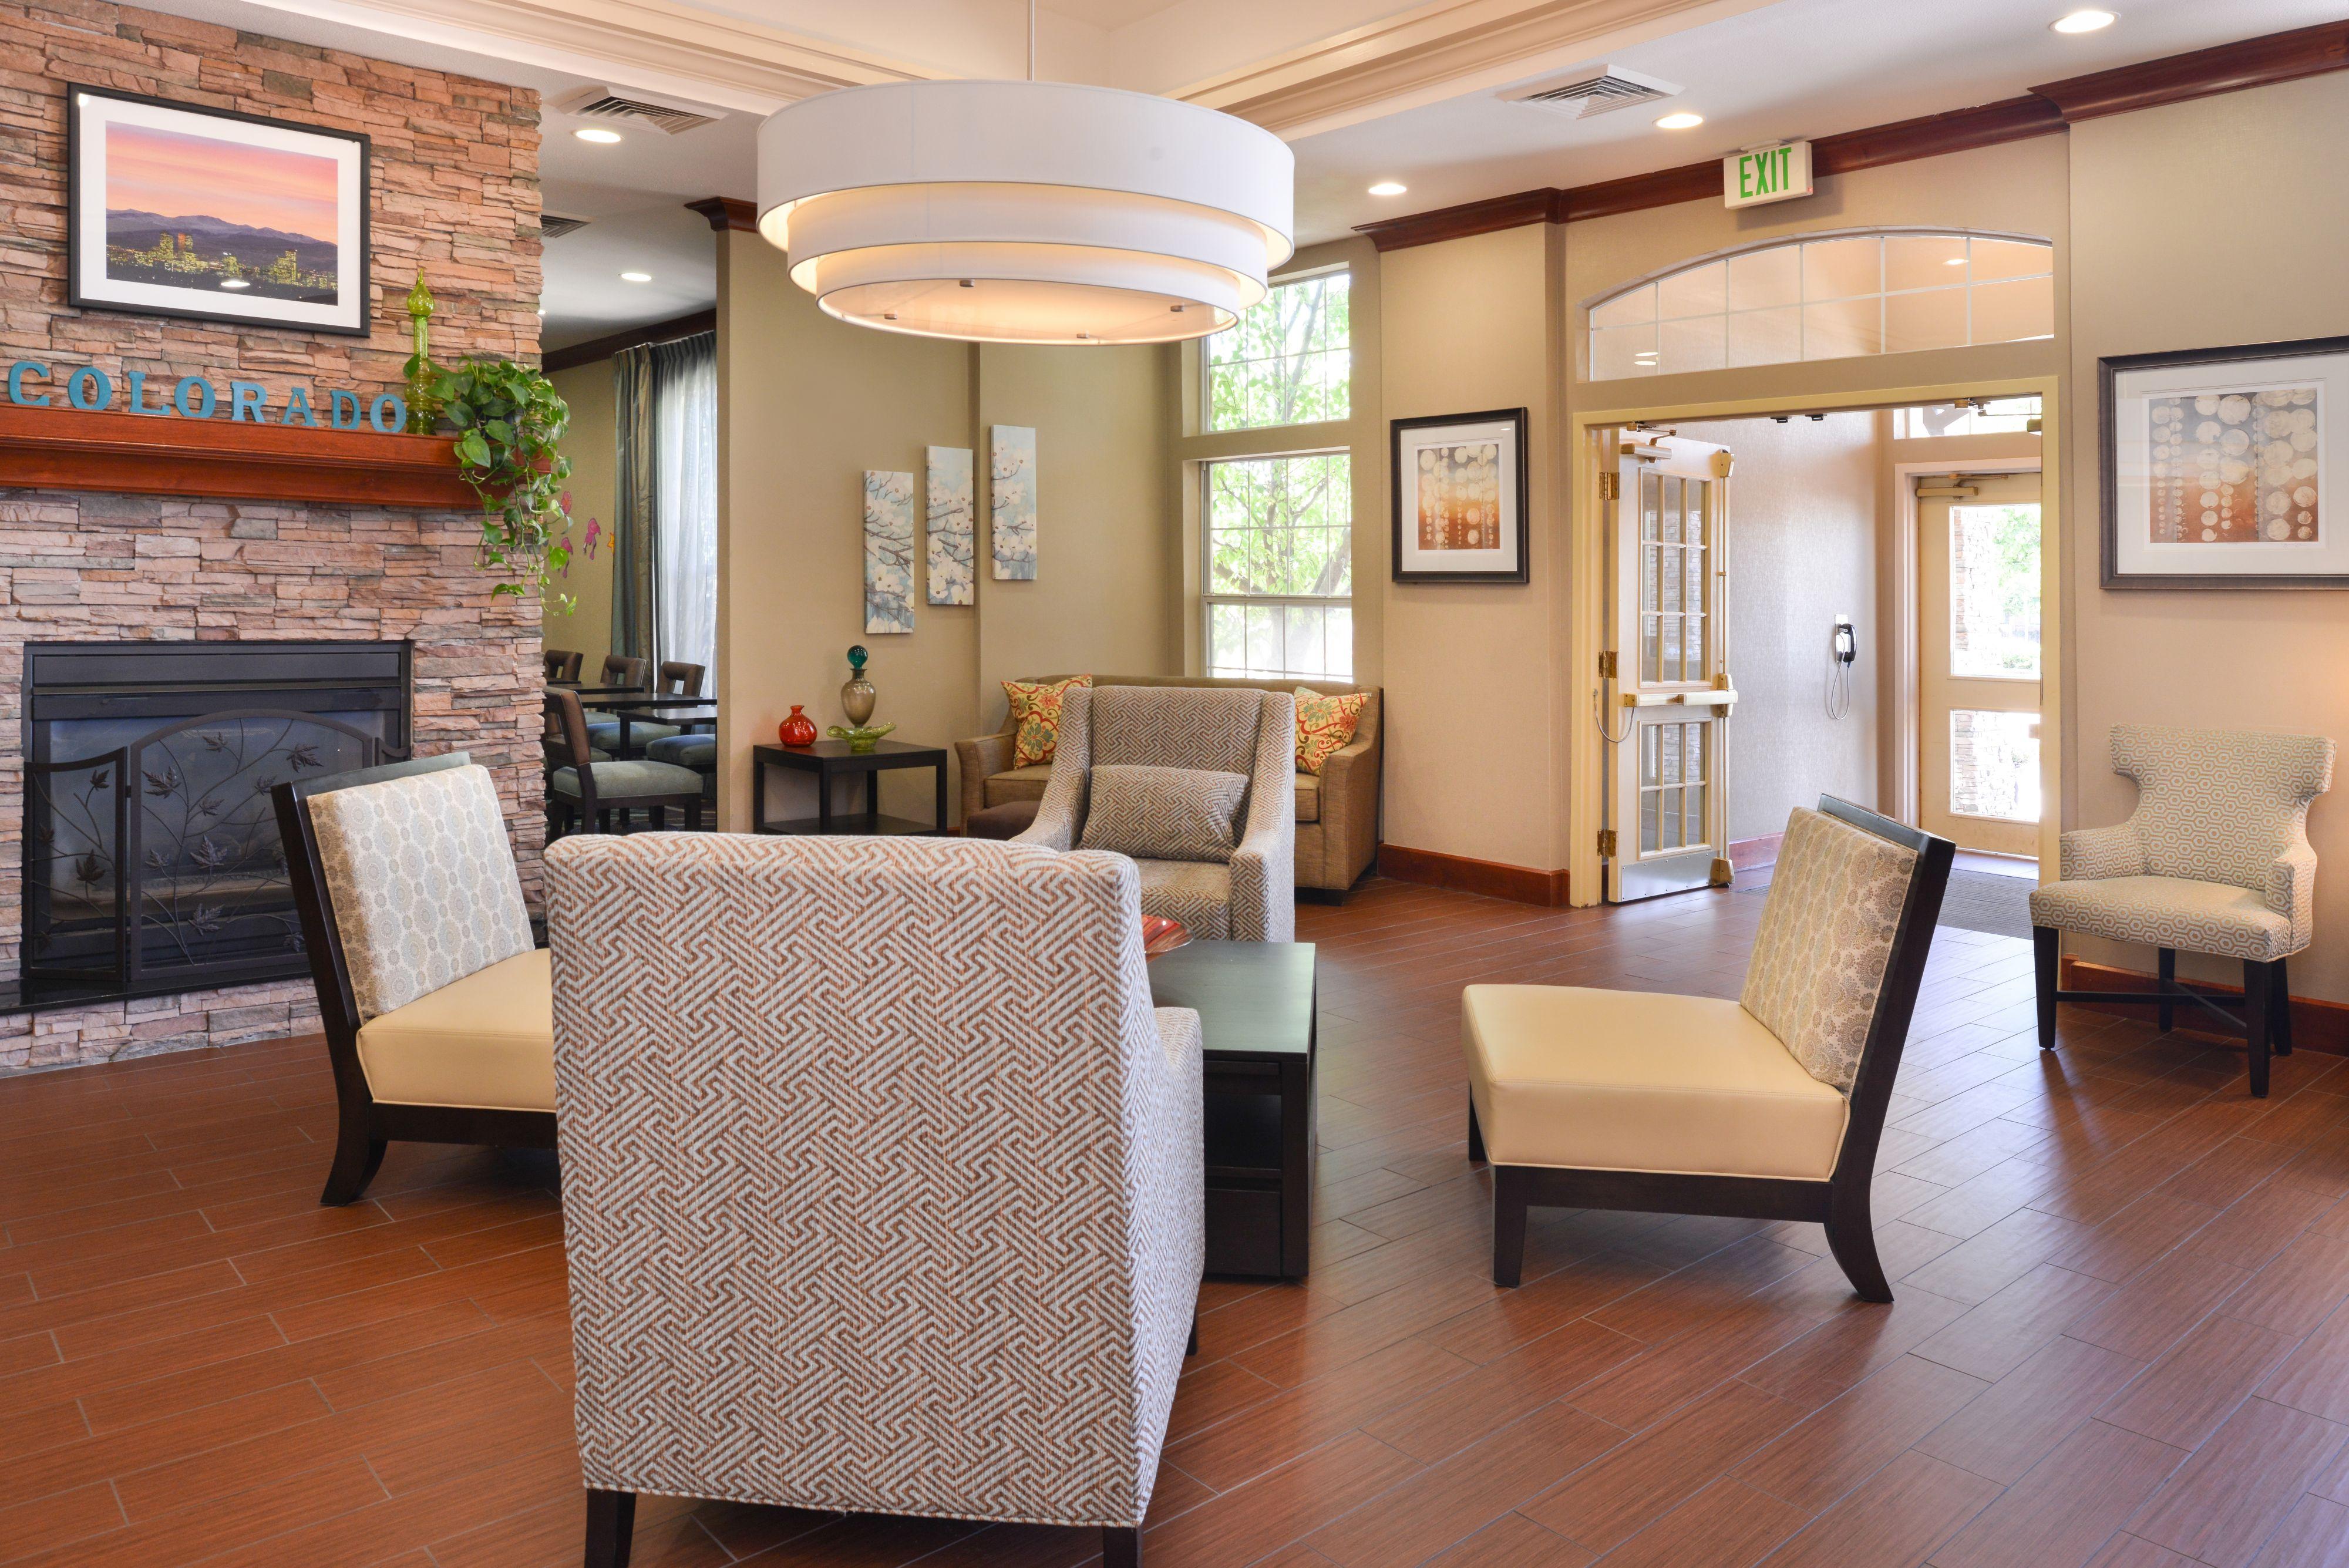 Staybridge Suites Denver Tech Center image 4